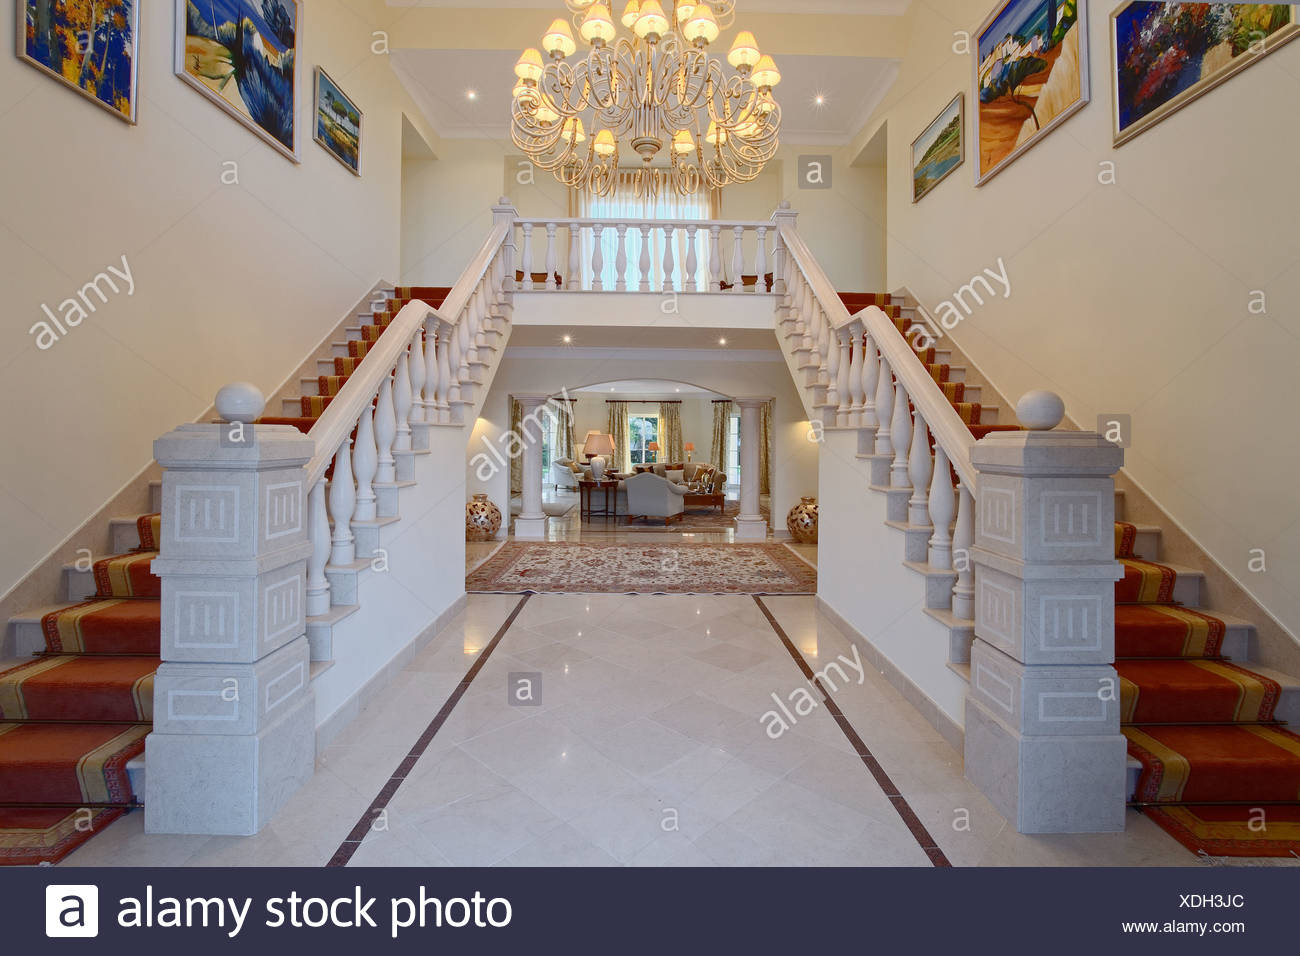 Kronleuchter Treppe ~ Moderner kronleuchter in halle mit doppelte treppe und marmor boden